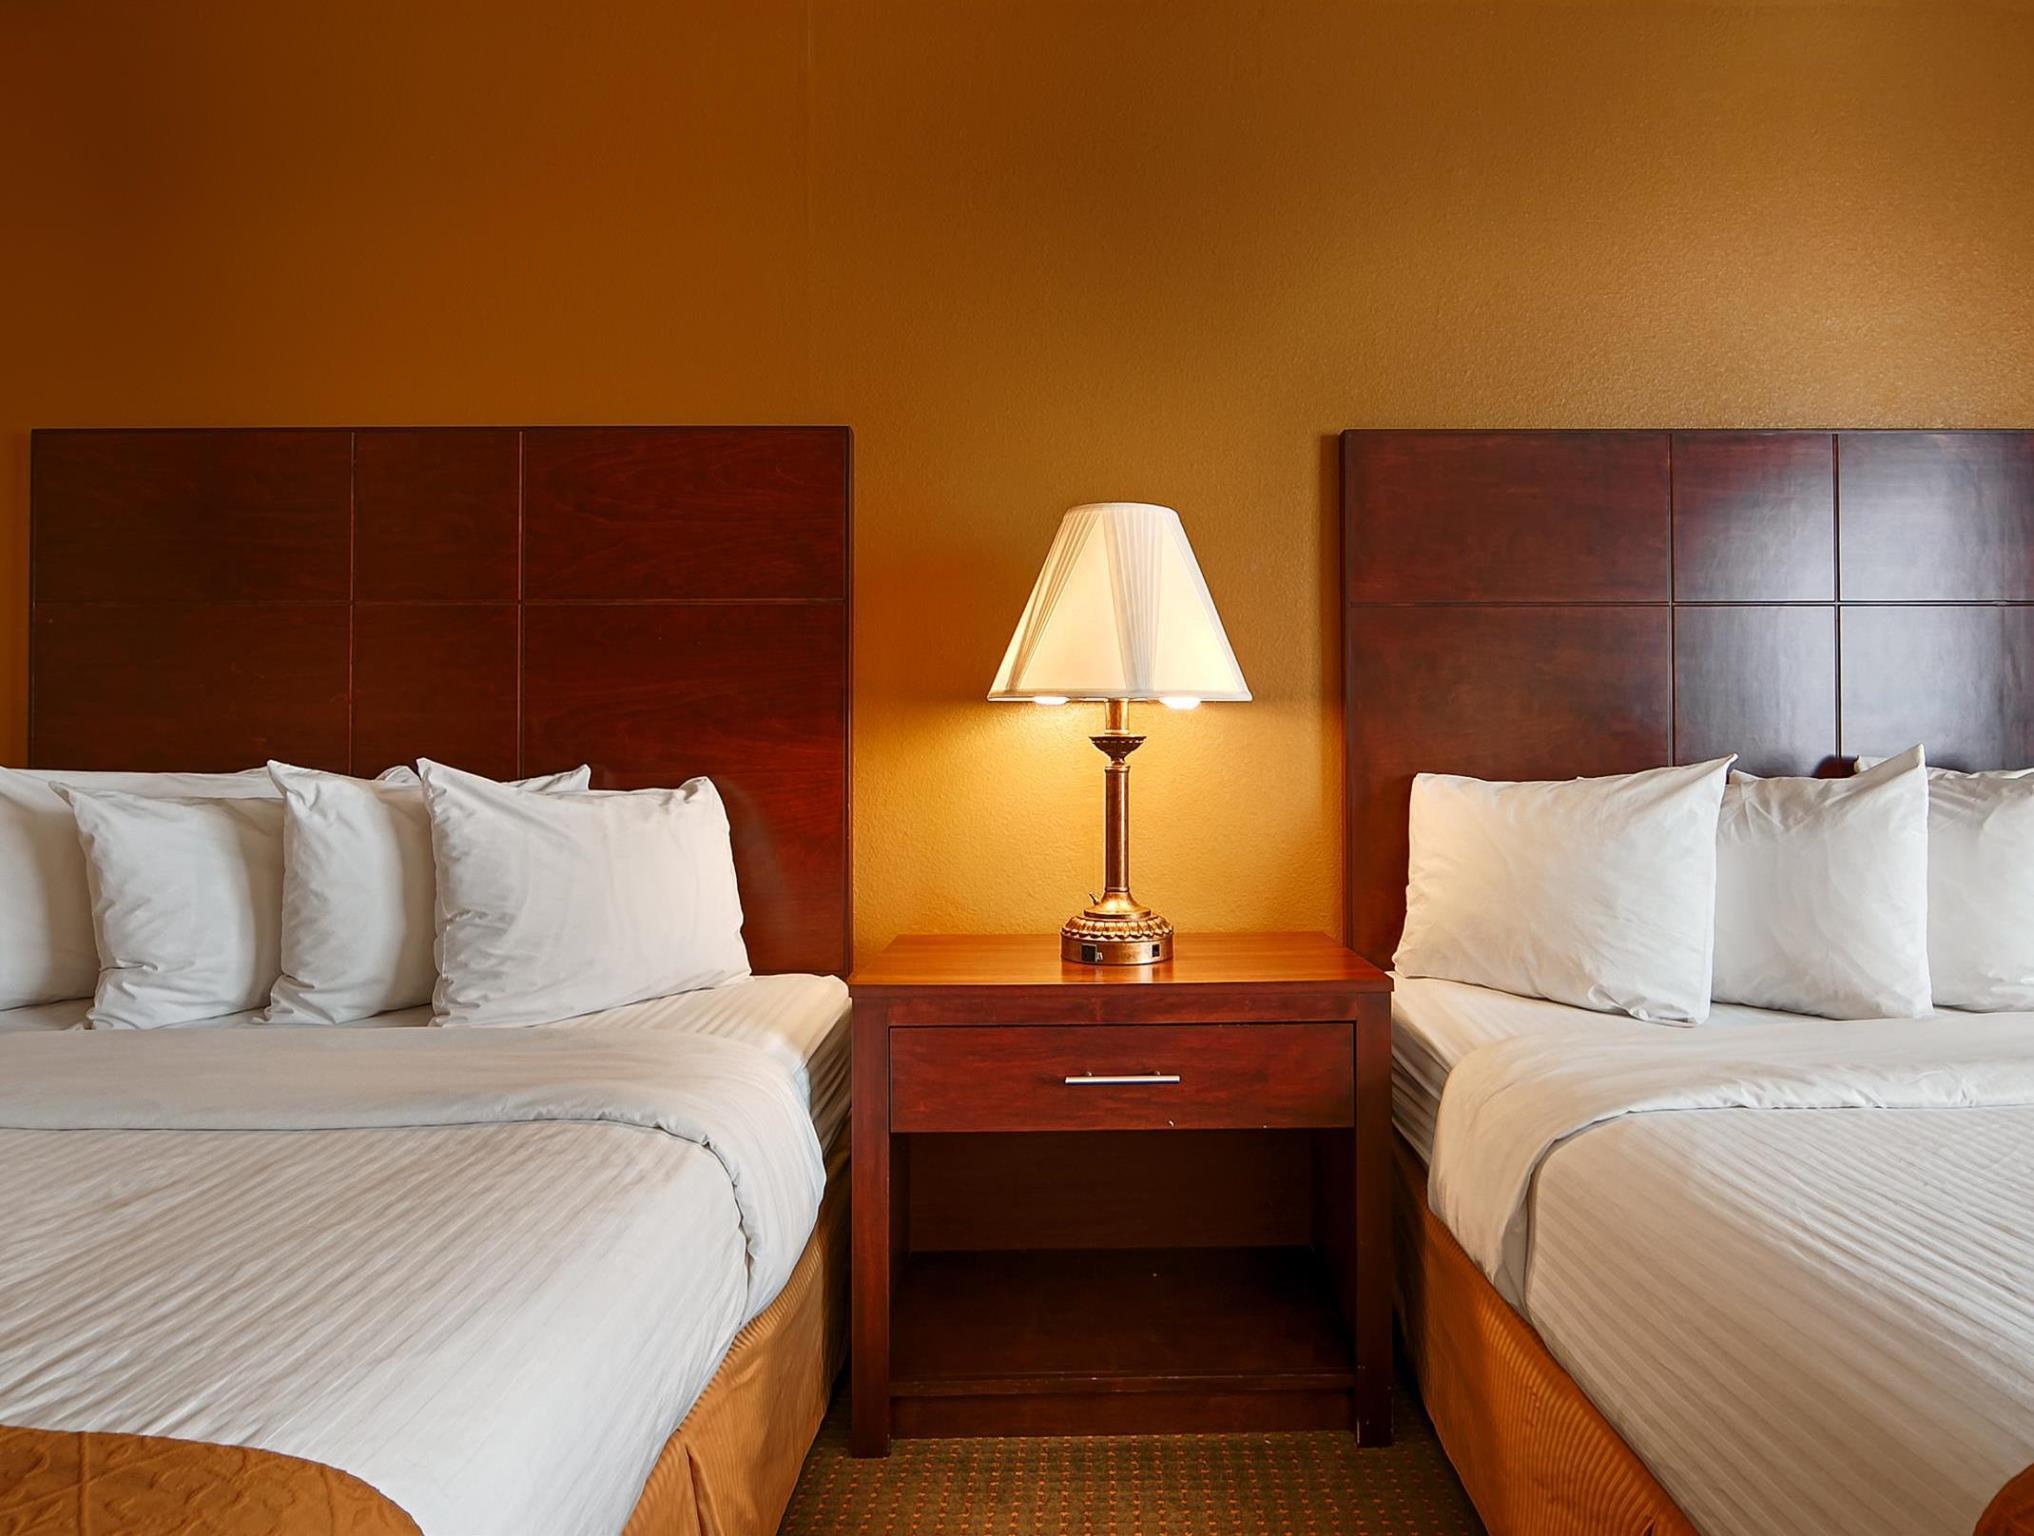 az comfort amp north suites avenue green s valley raleigh comforter inn hotels crabtree carolina glenwood